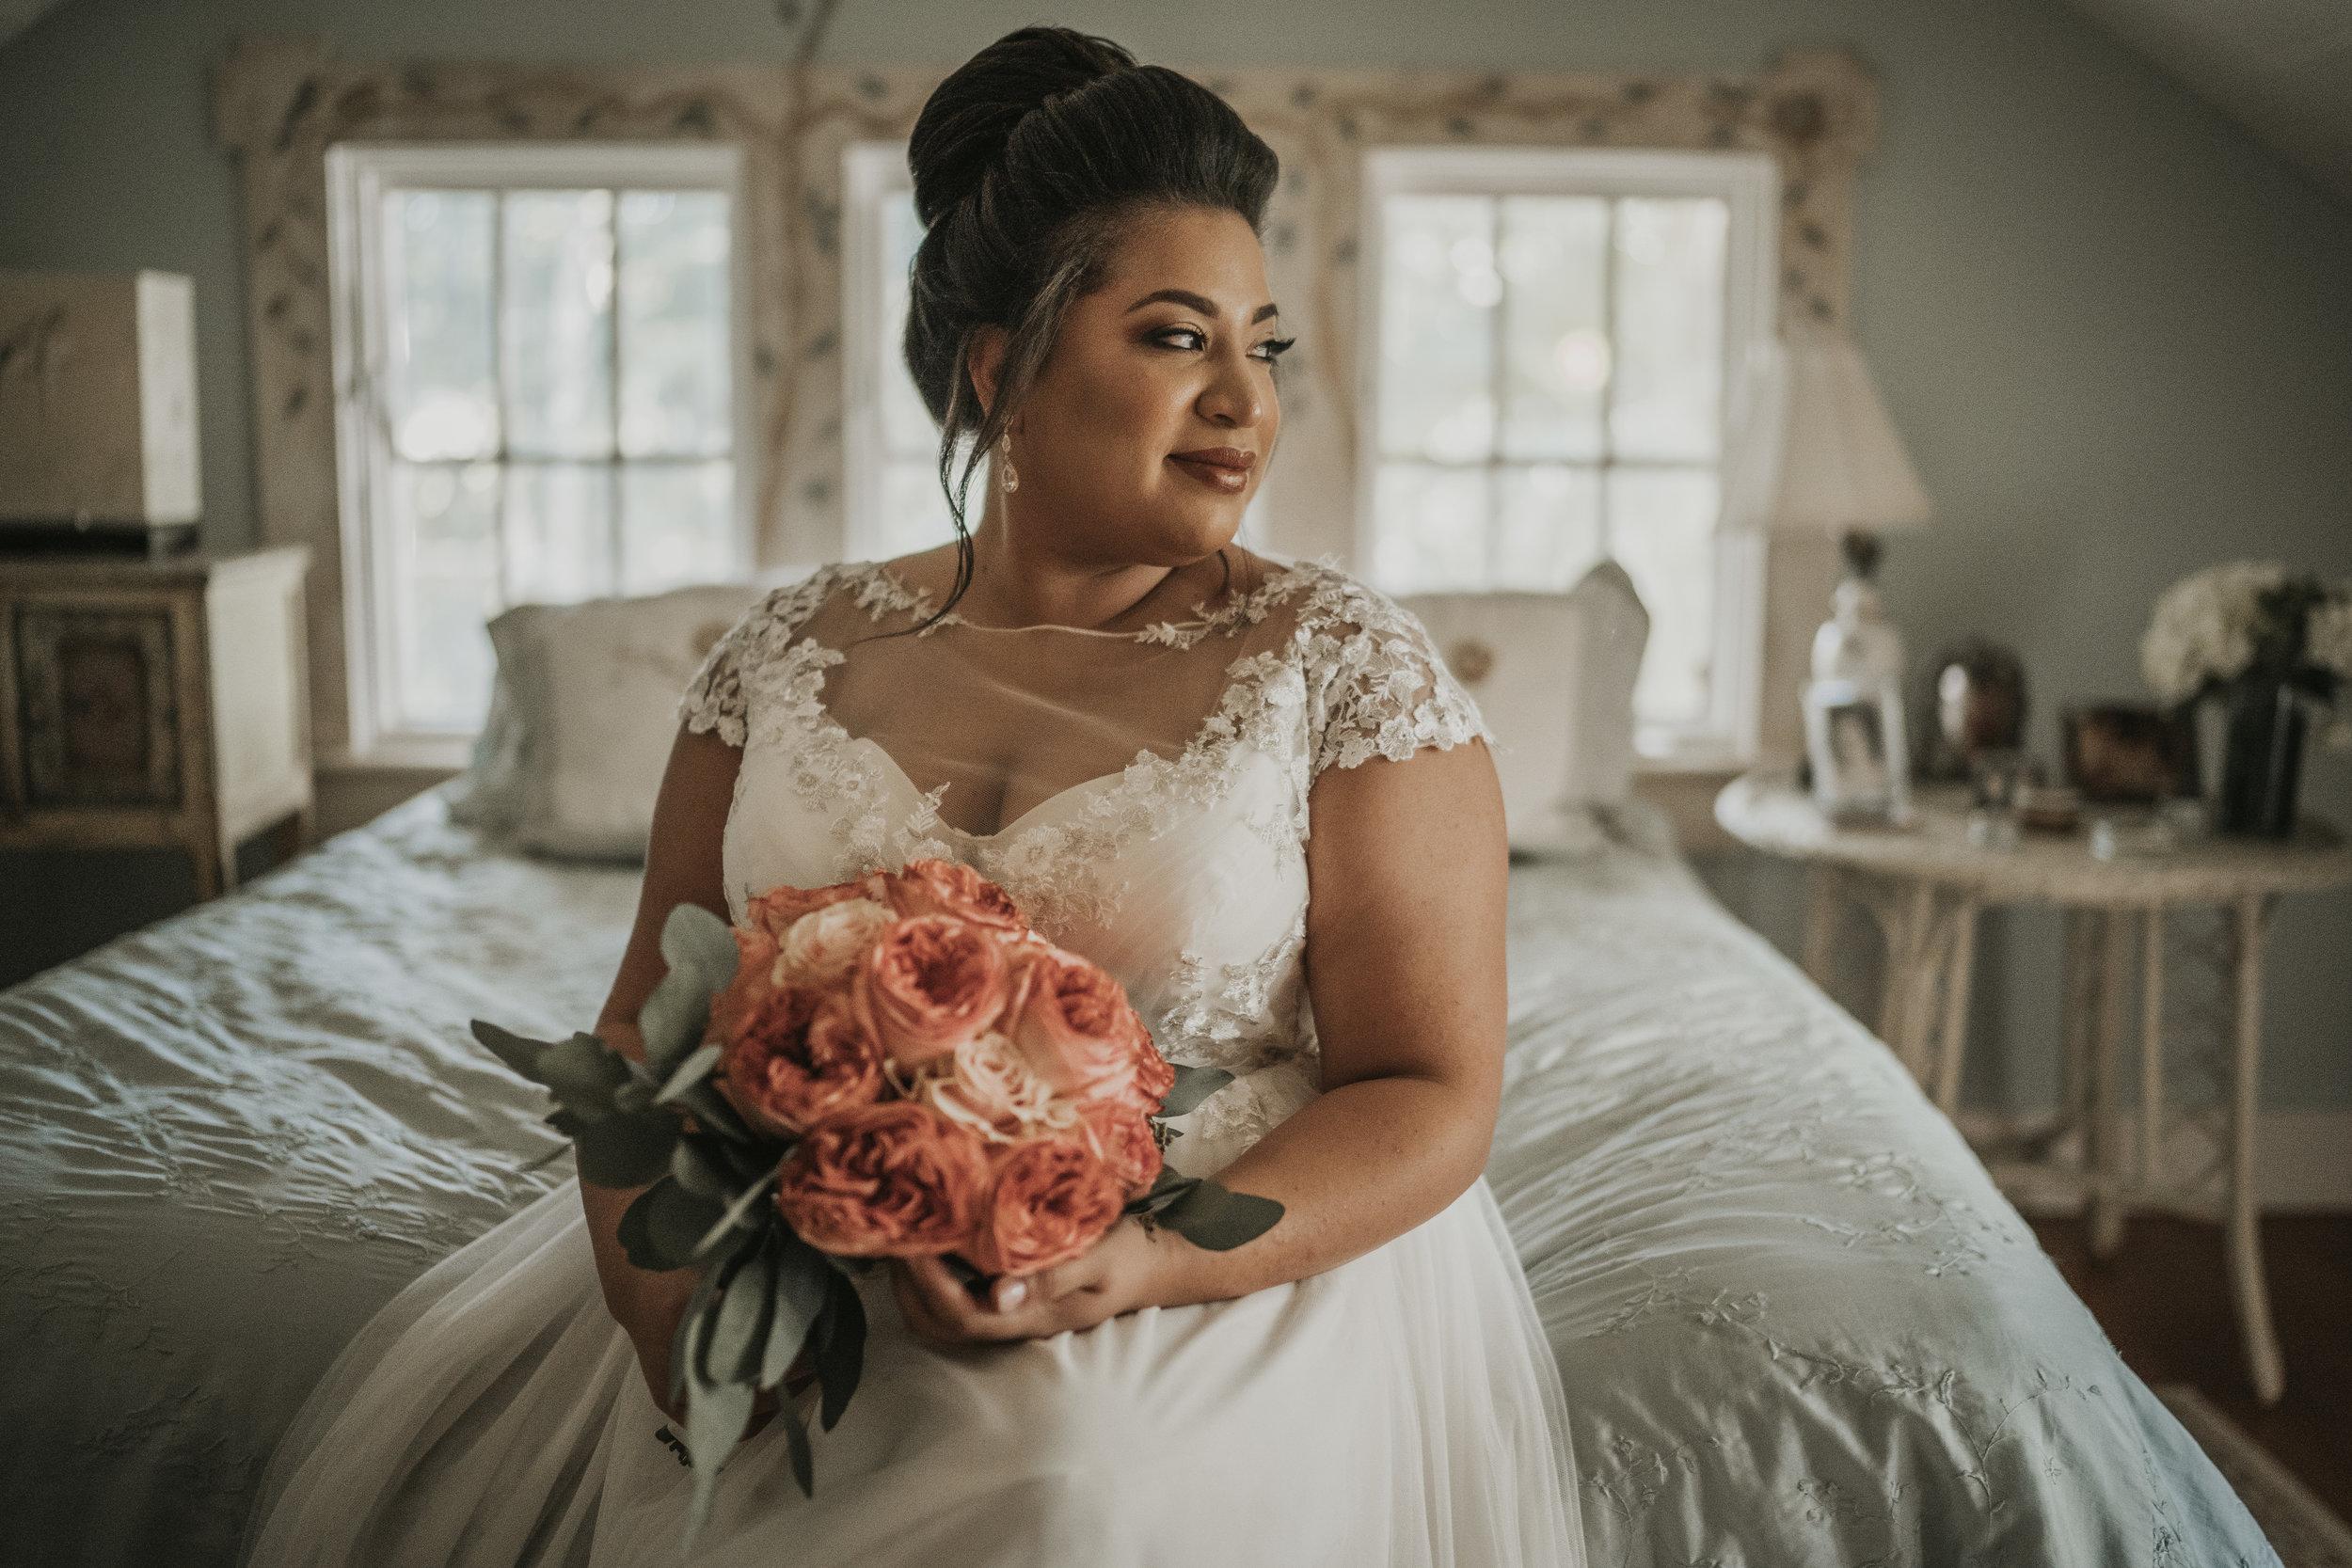 203MICHI&GABEWEDDINGDAY(WeddingFinal).jpg